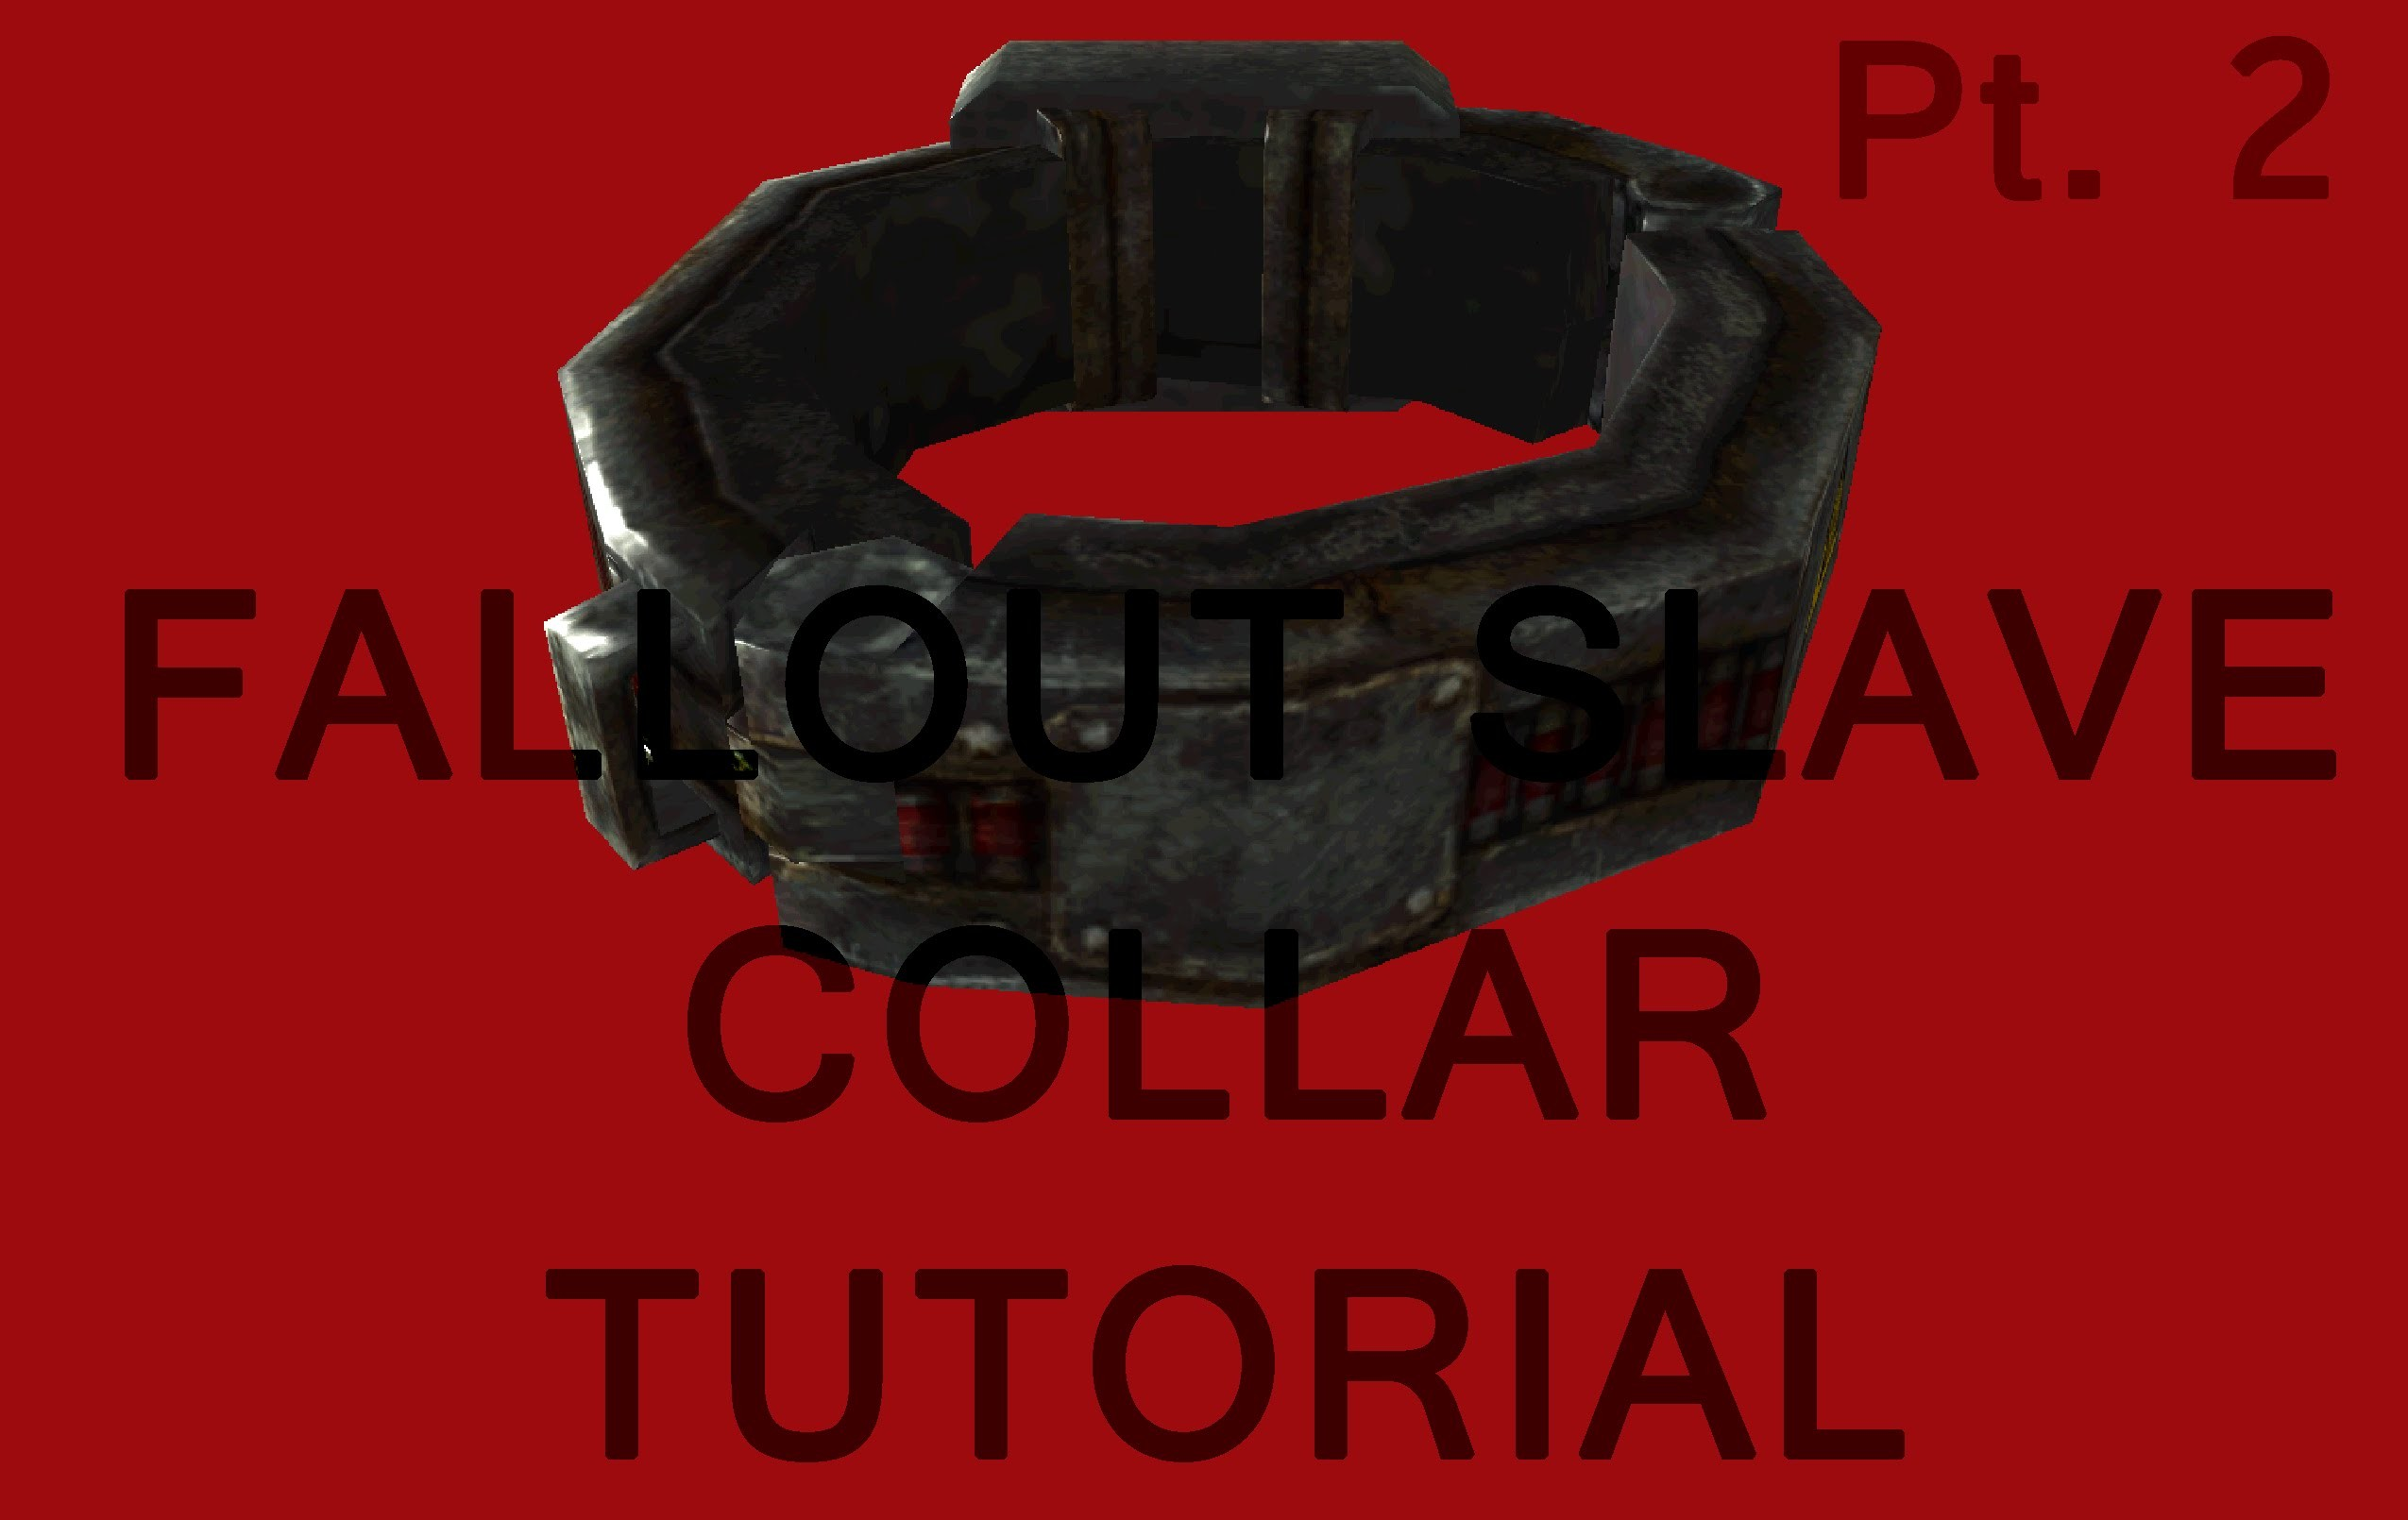 Fallout 3.NV Slave Collar Tutorial Pt. 2